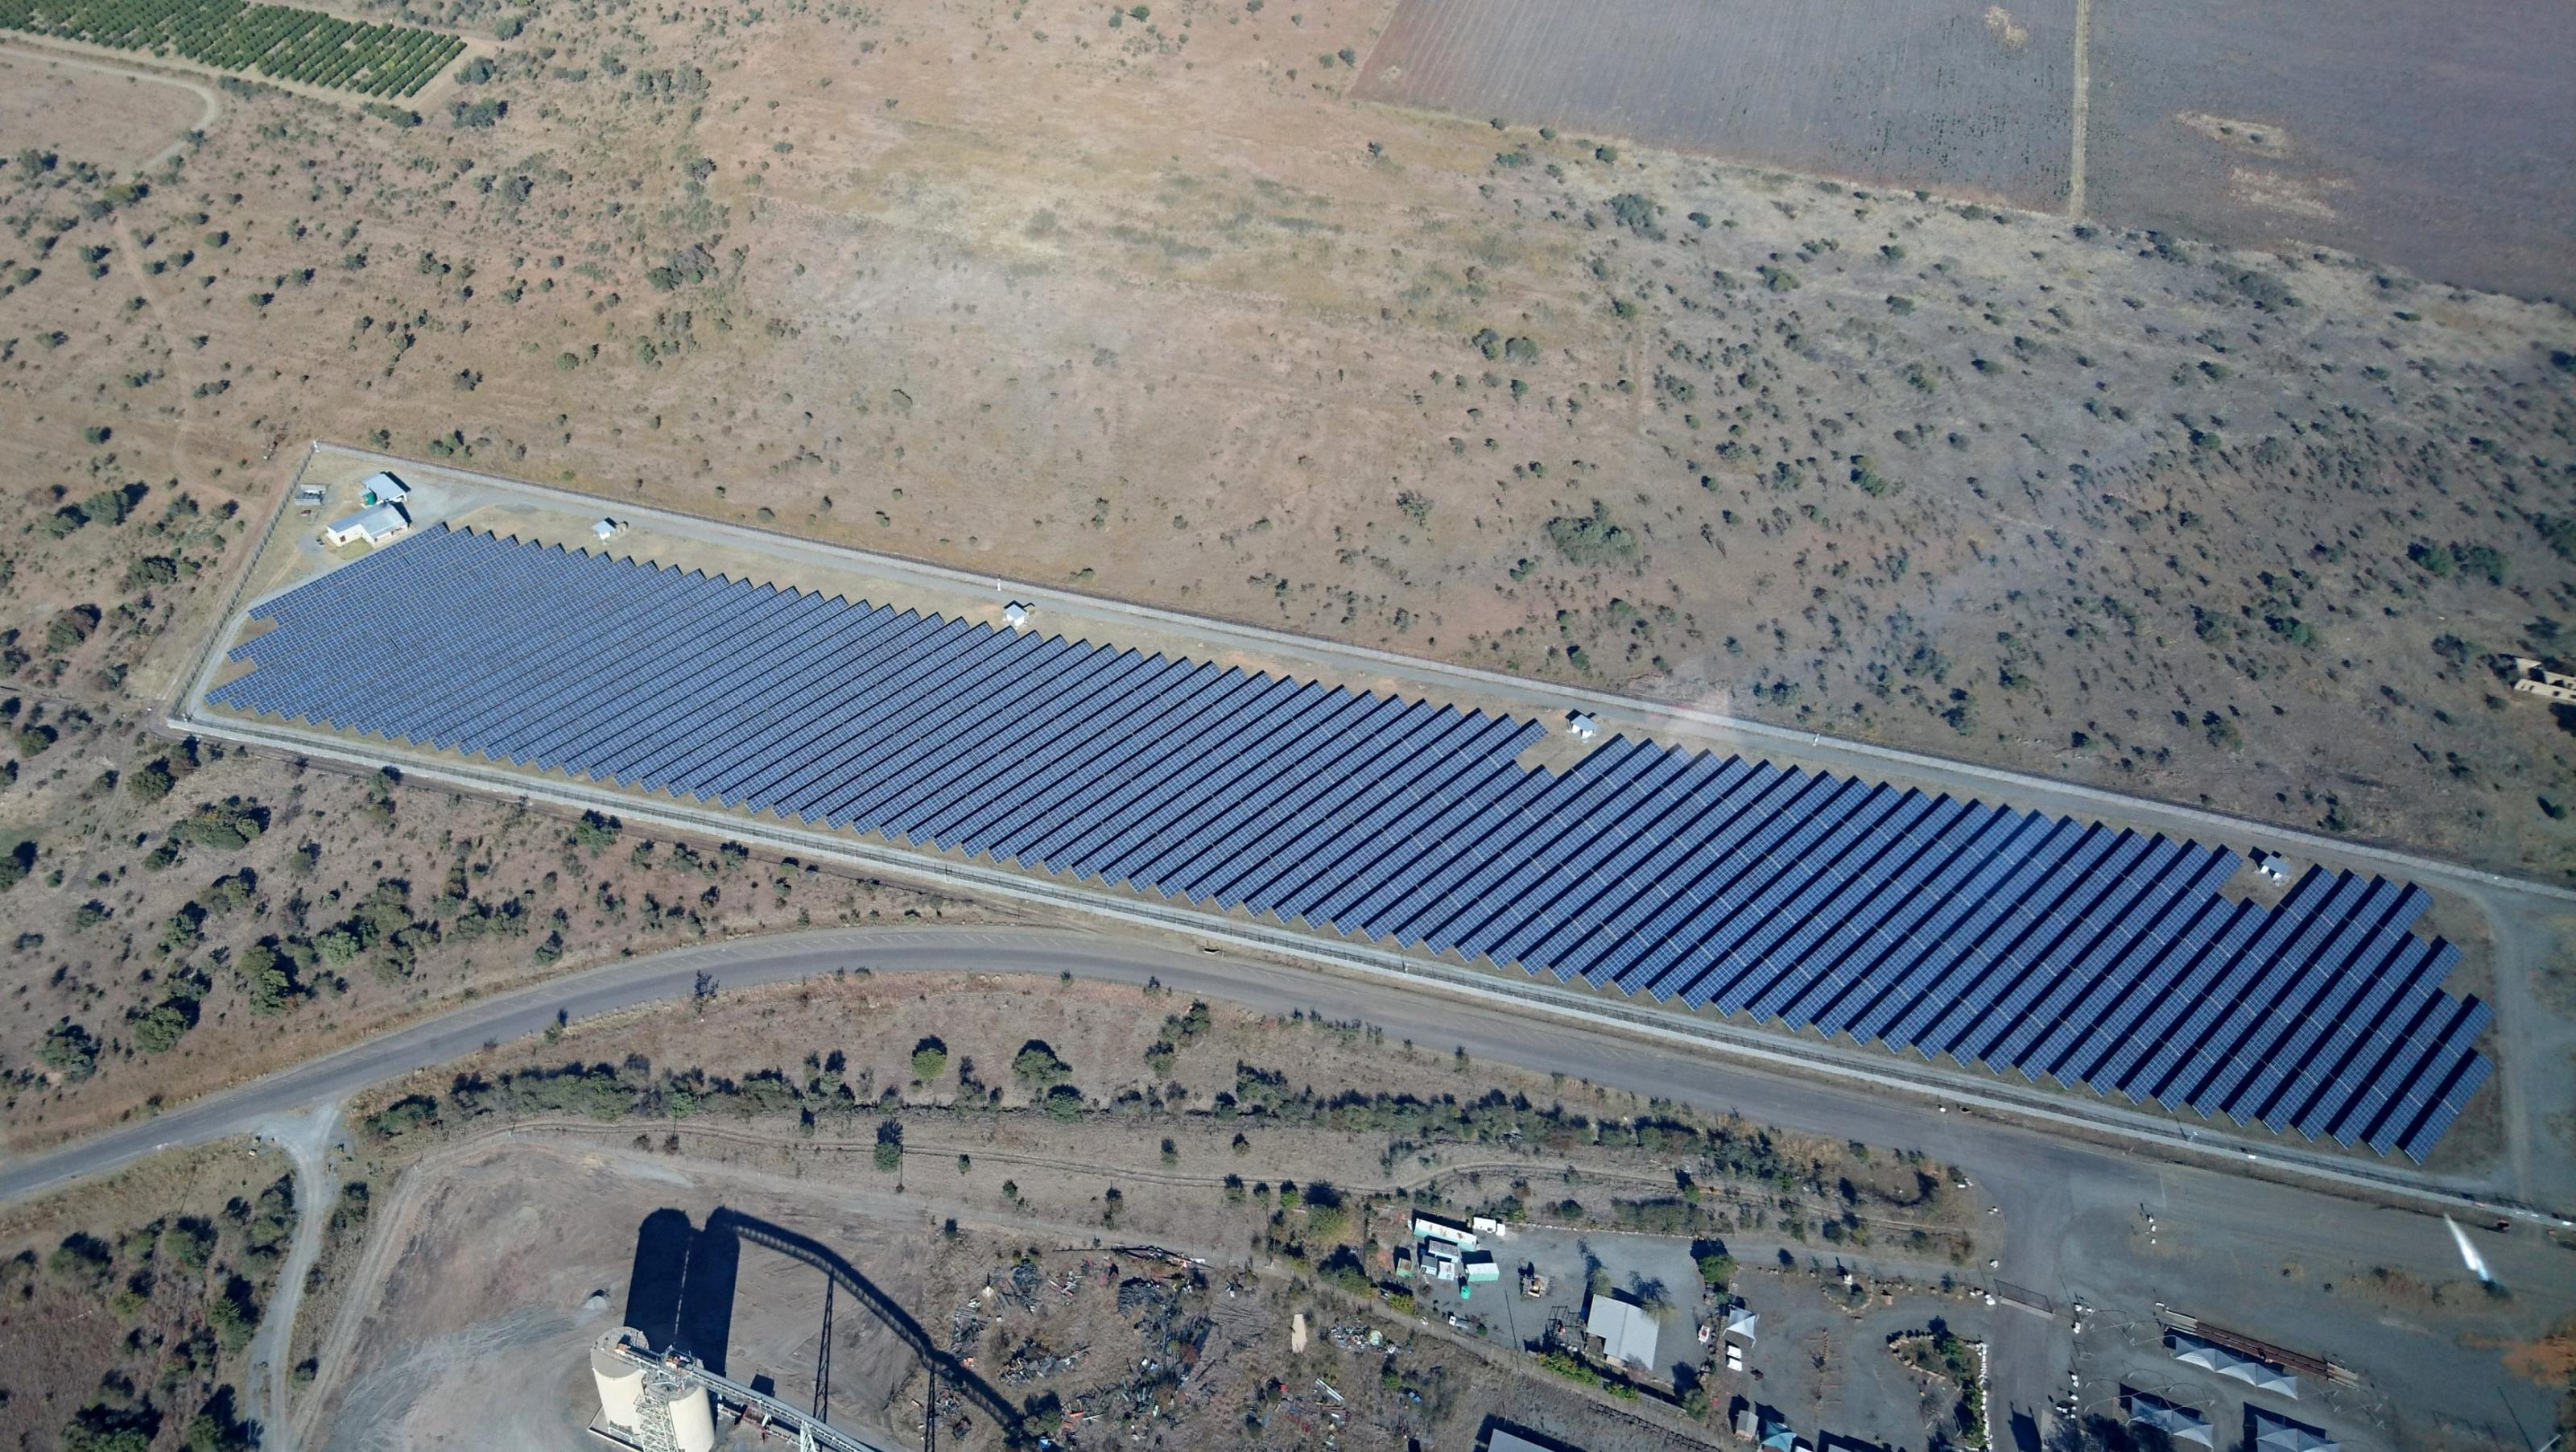 Renewable solar power over blockchain will light up rural Africa